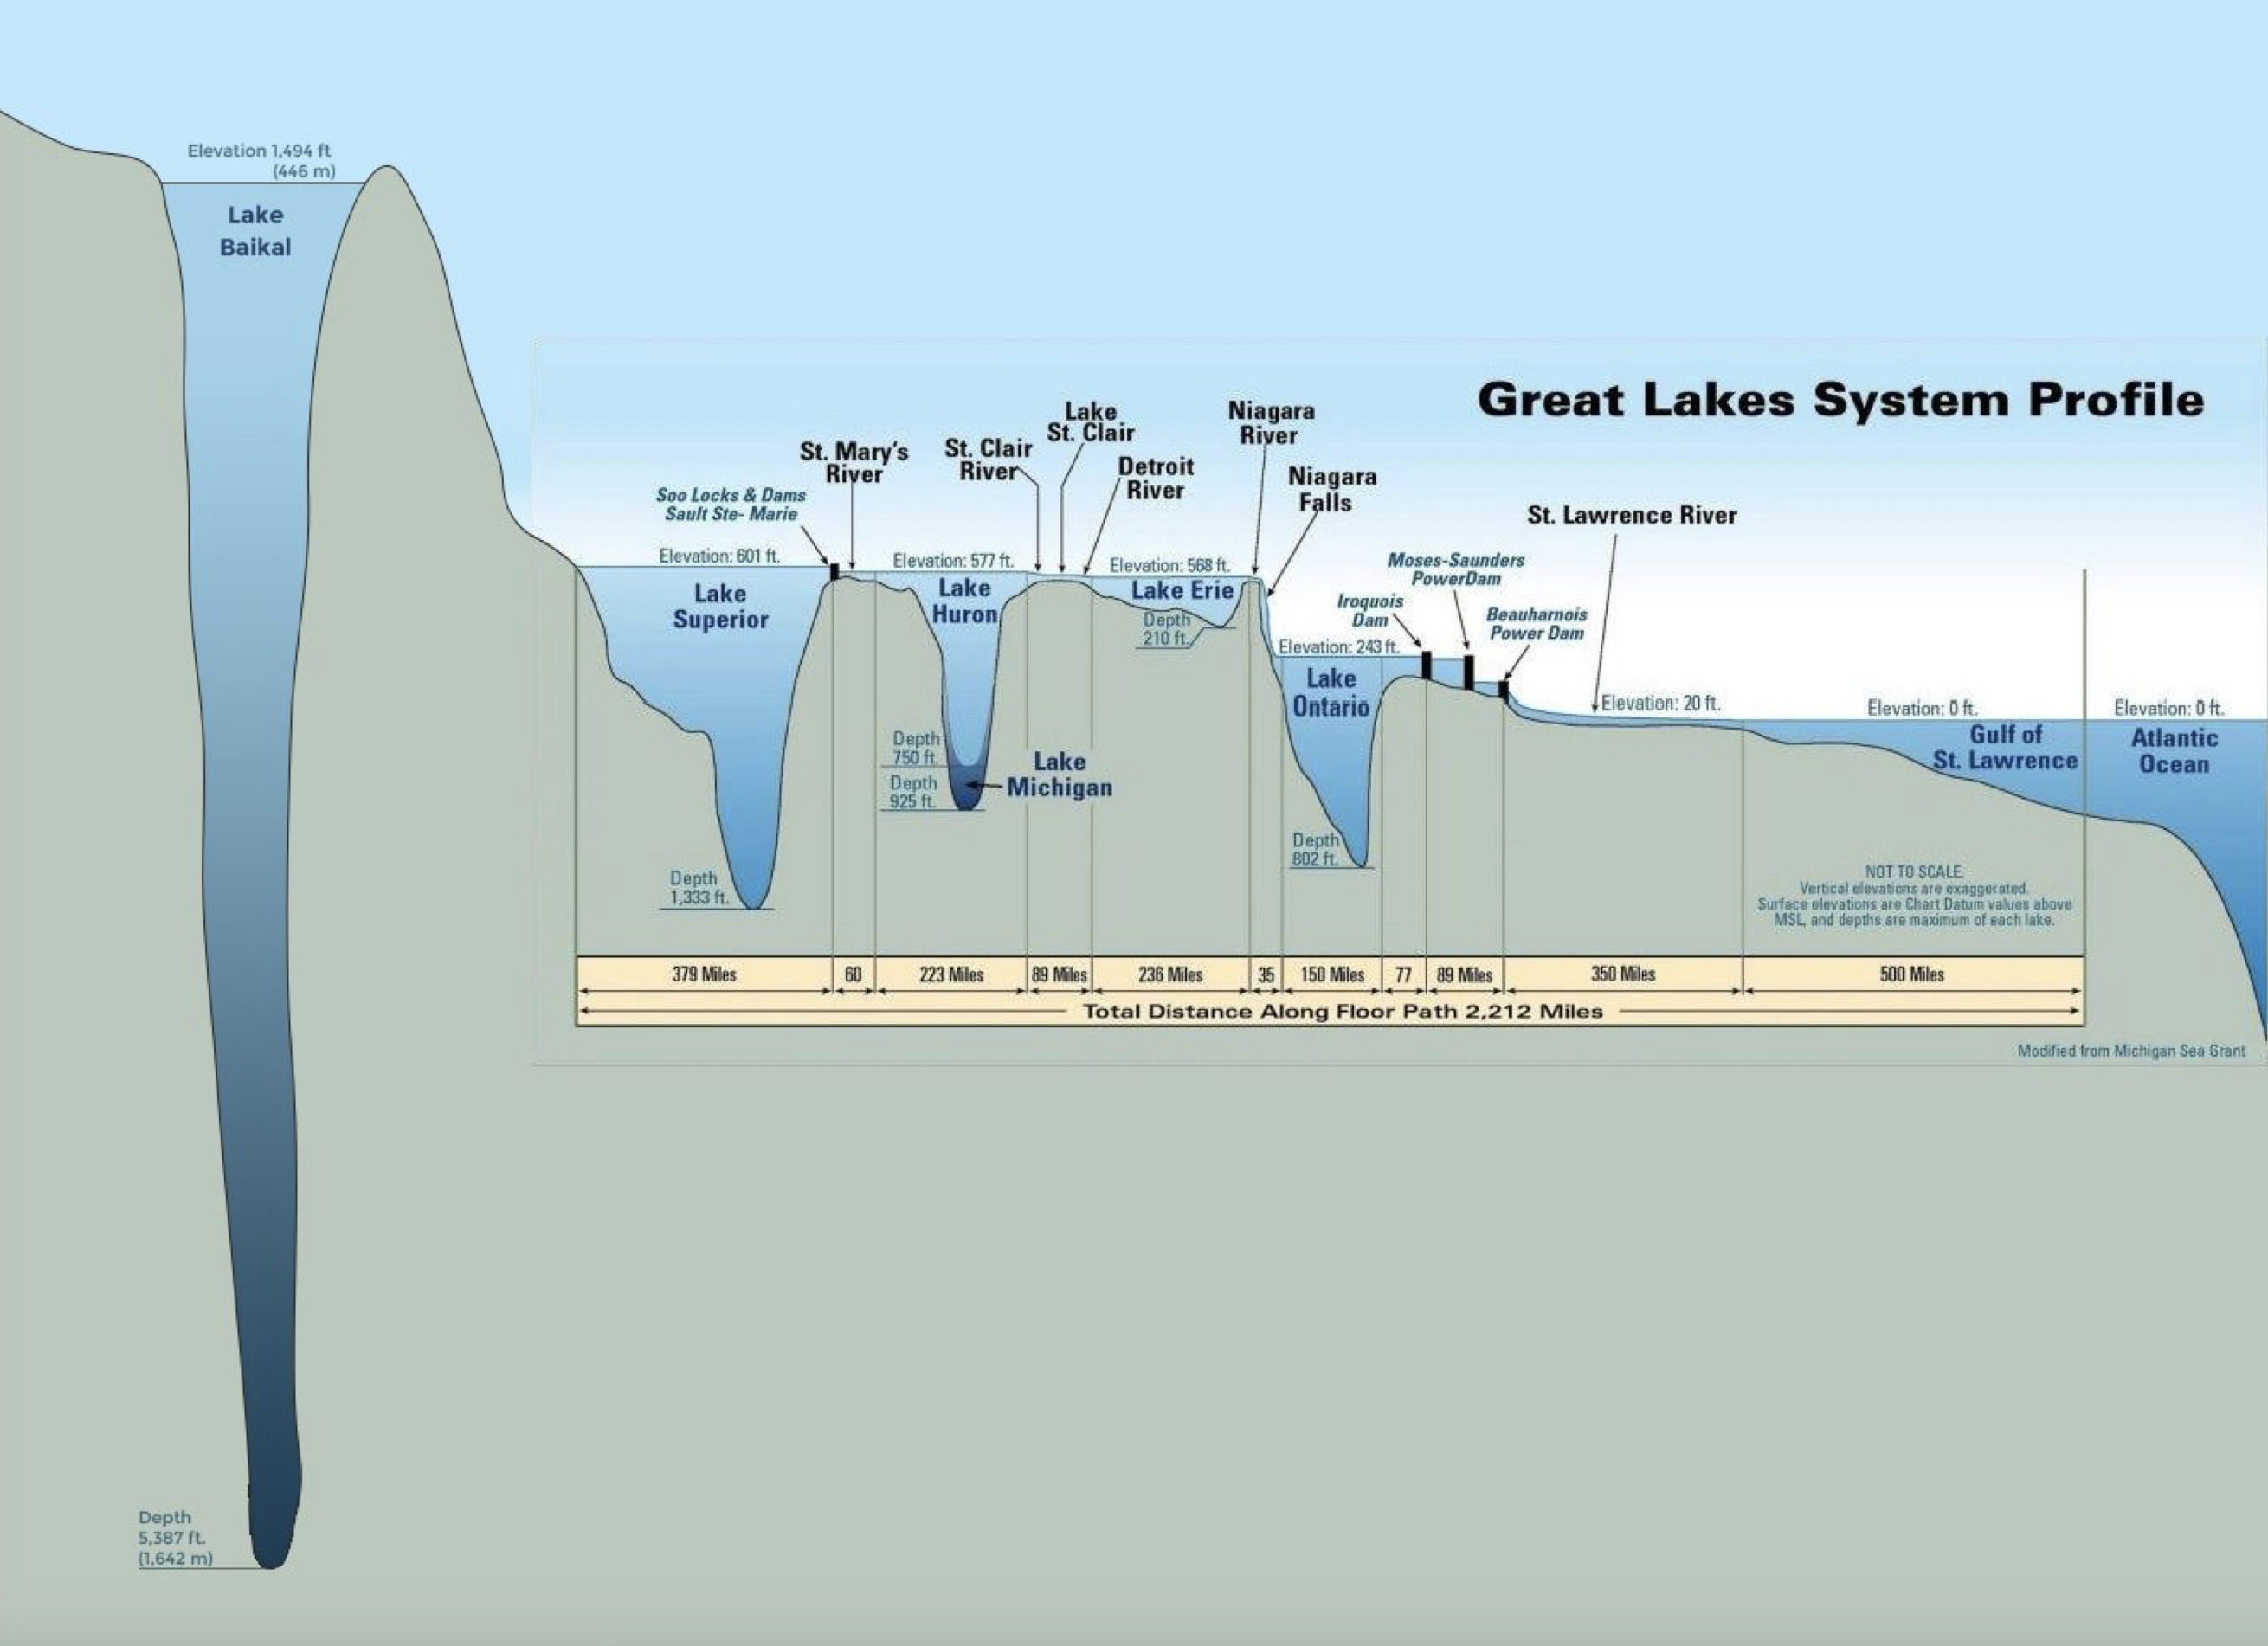 Great Lake System Profile. Bajakalsjøen, verdens dypeste innsjø